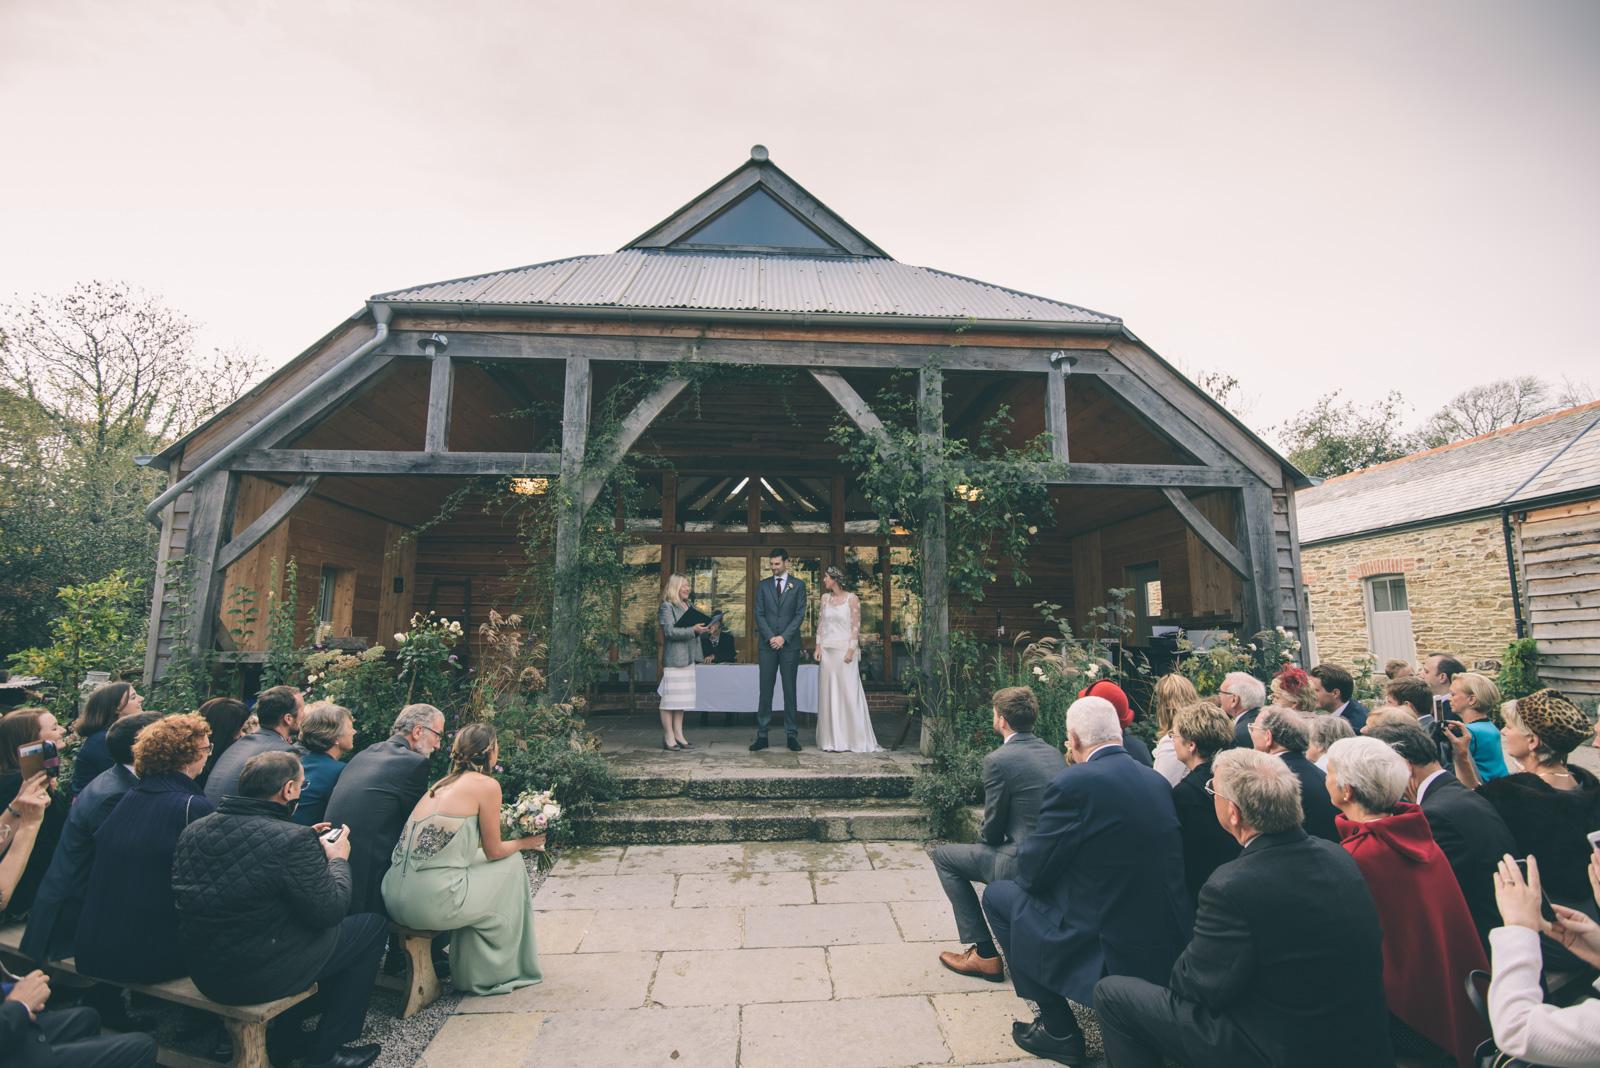 nancarrow-wedding-photography-59.jpg